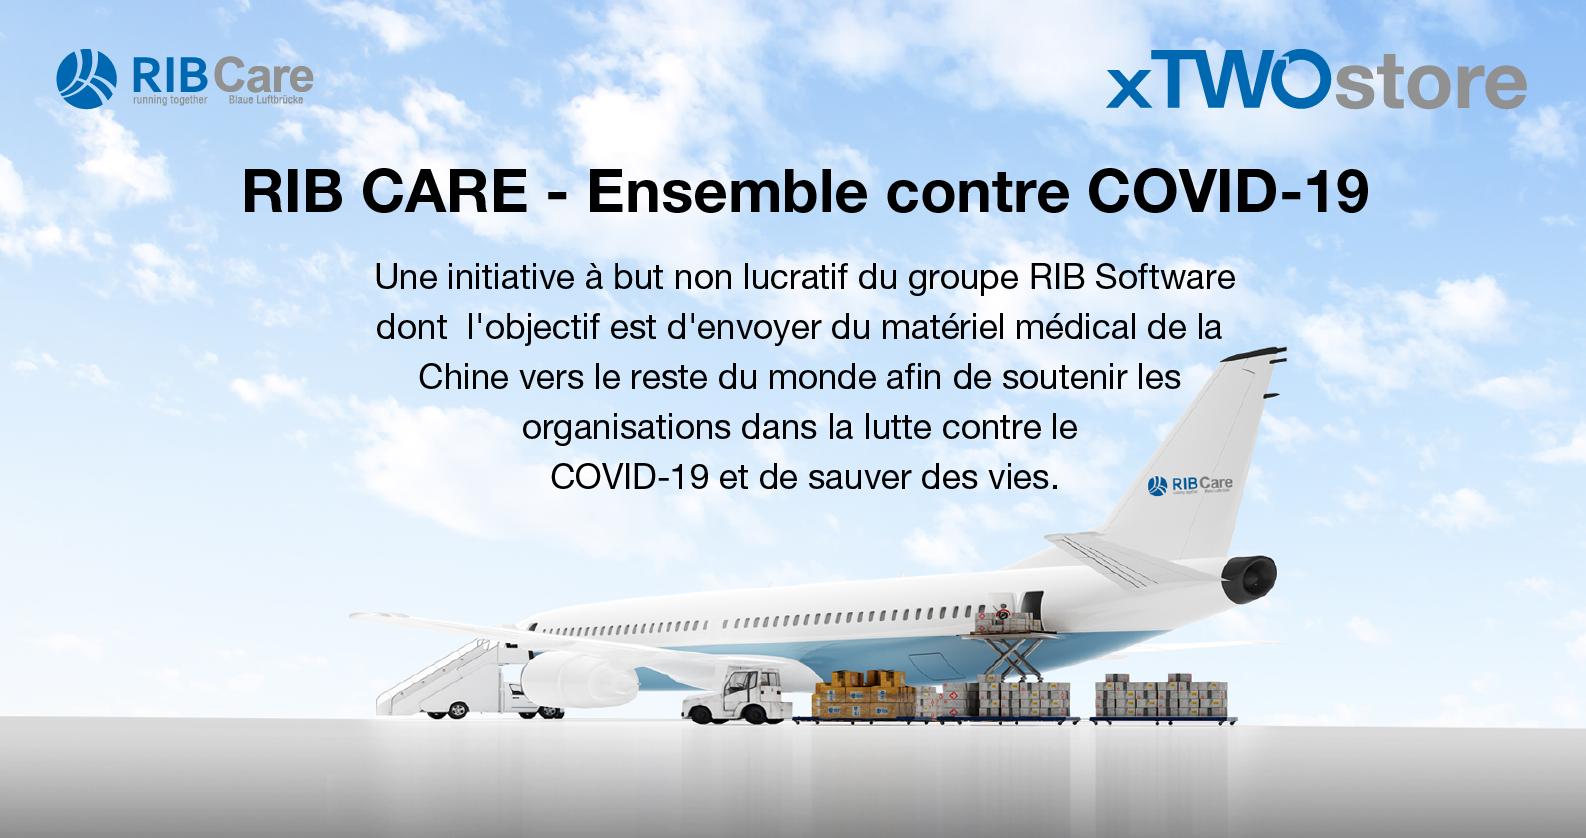 RIB Care - fournitures médicales essentielles chez xTWOstore